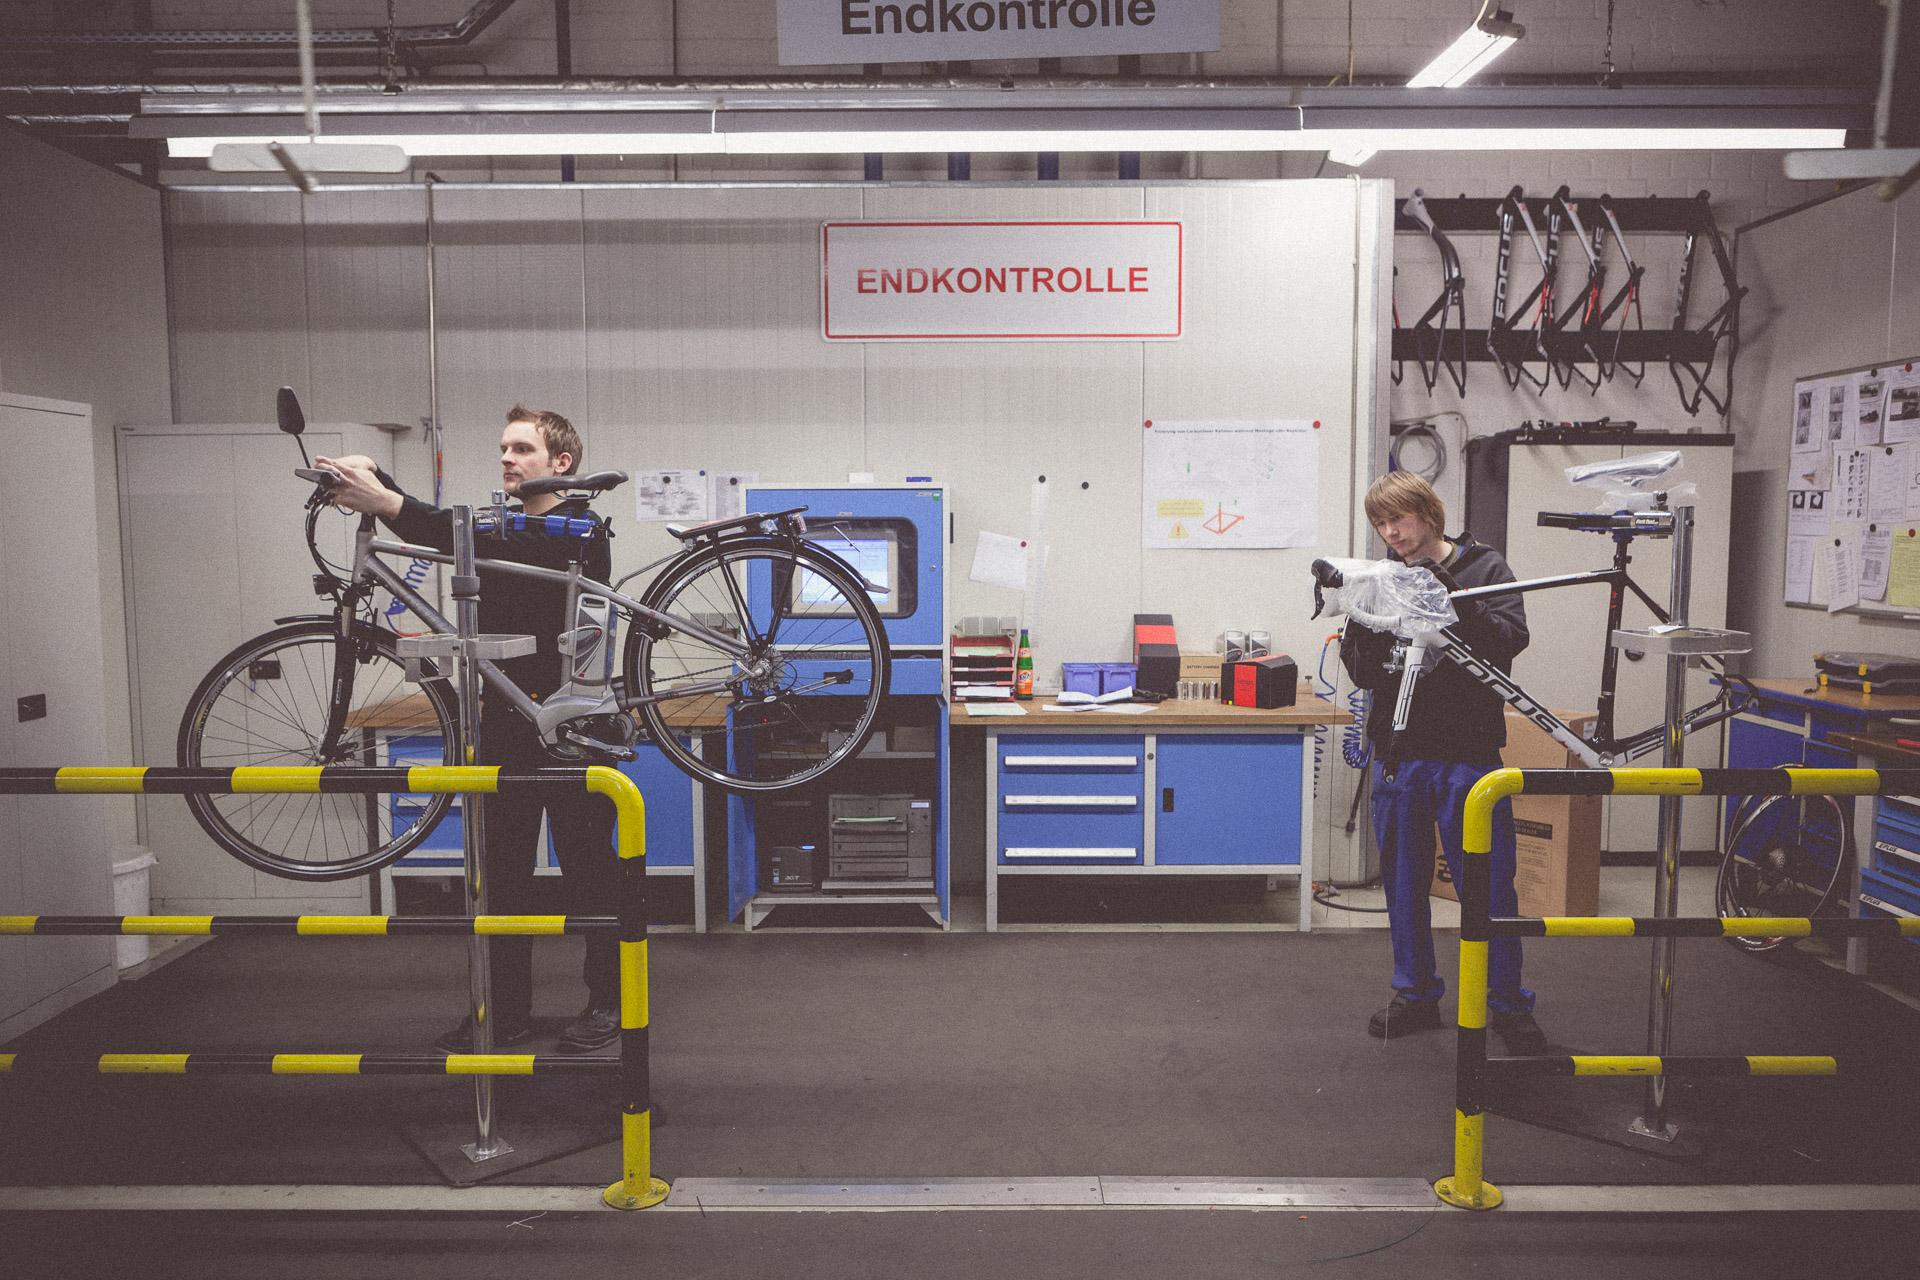 54-Derby-Cycle-Werke-Fahrradproduktion